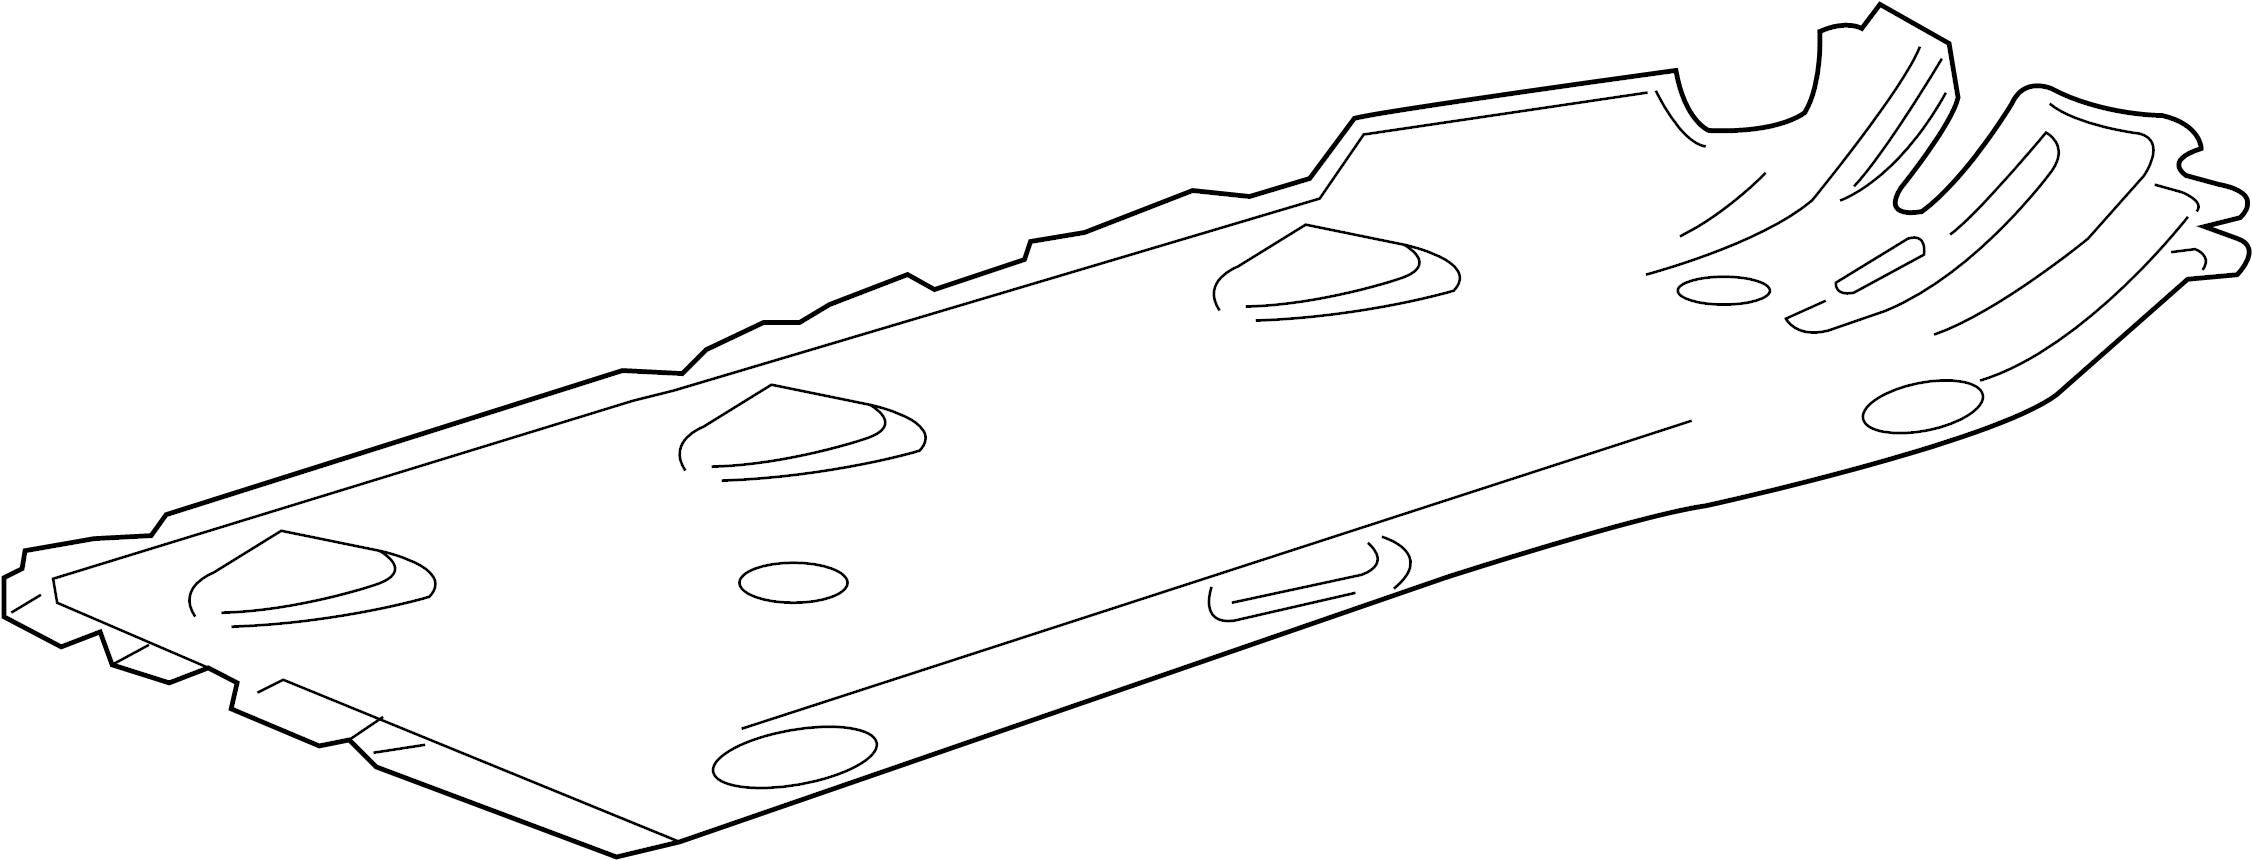 Chevrolet Impala Shield Front Left Floor Deflector